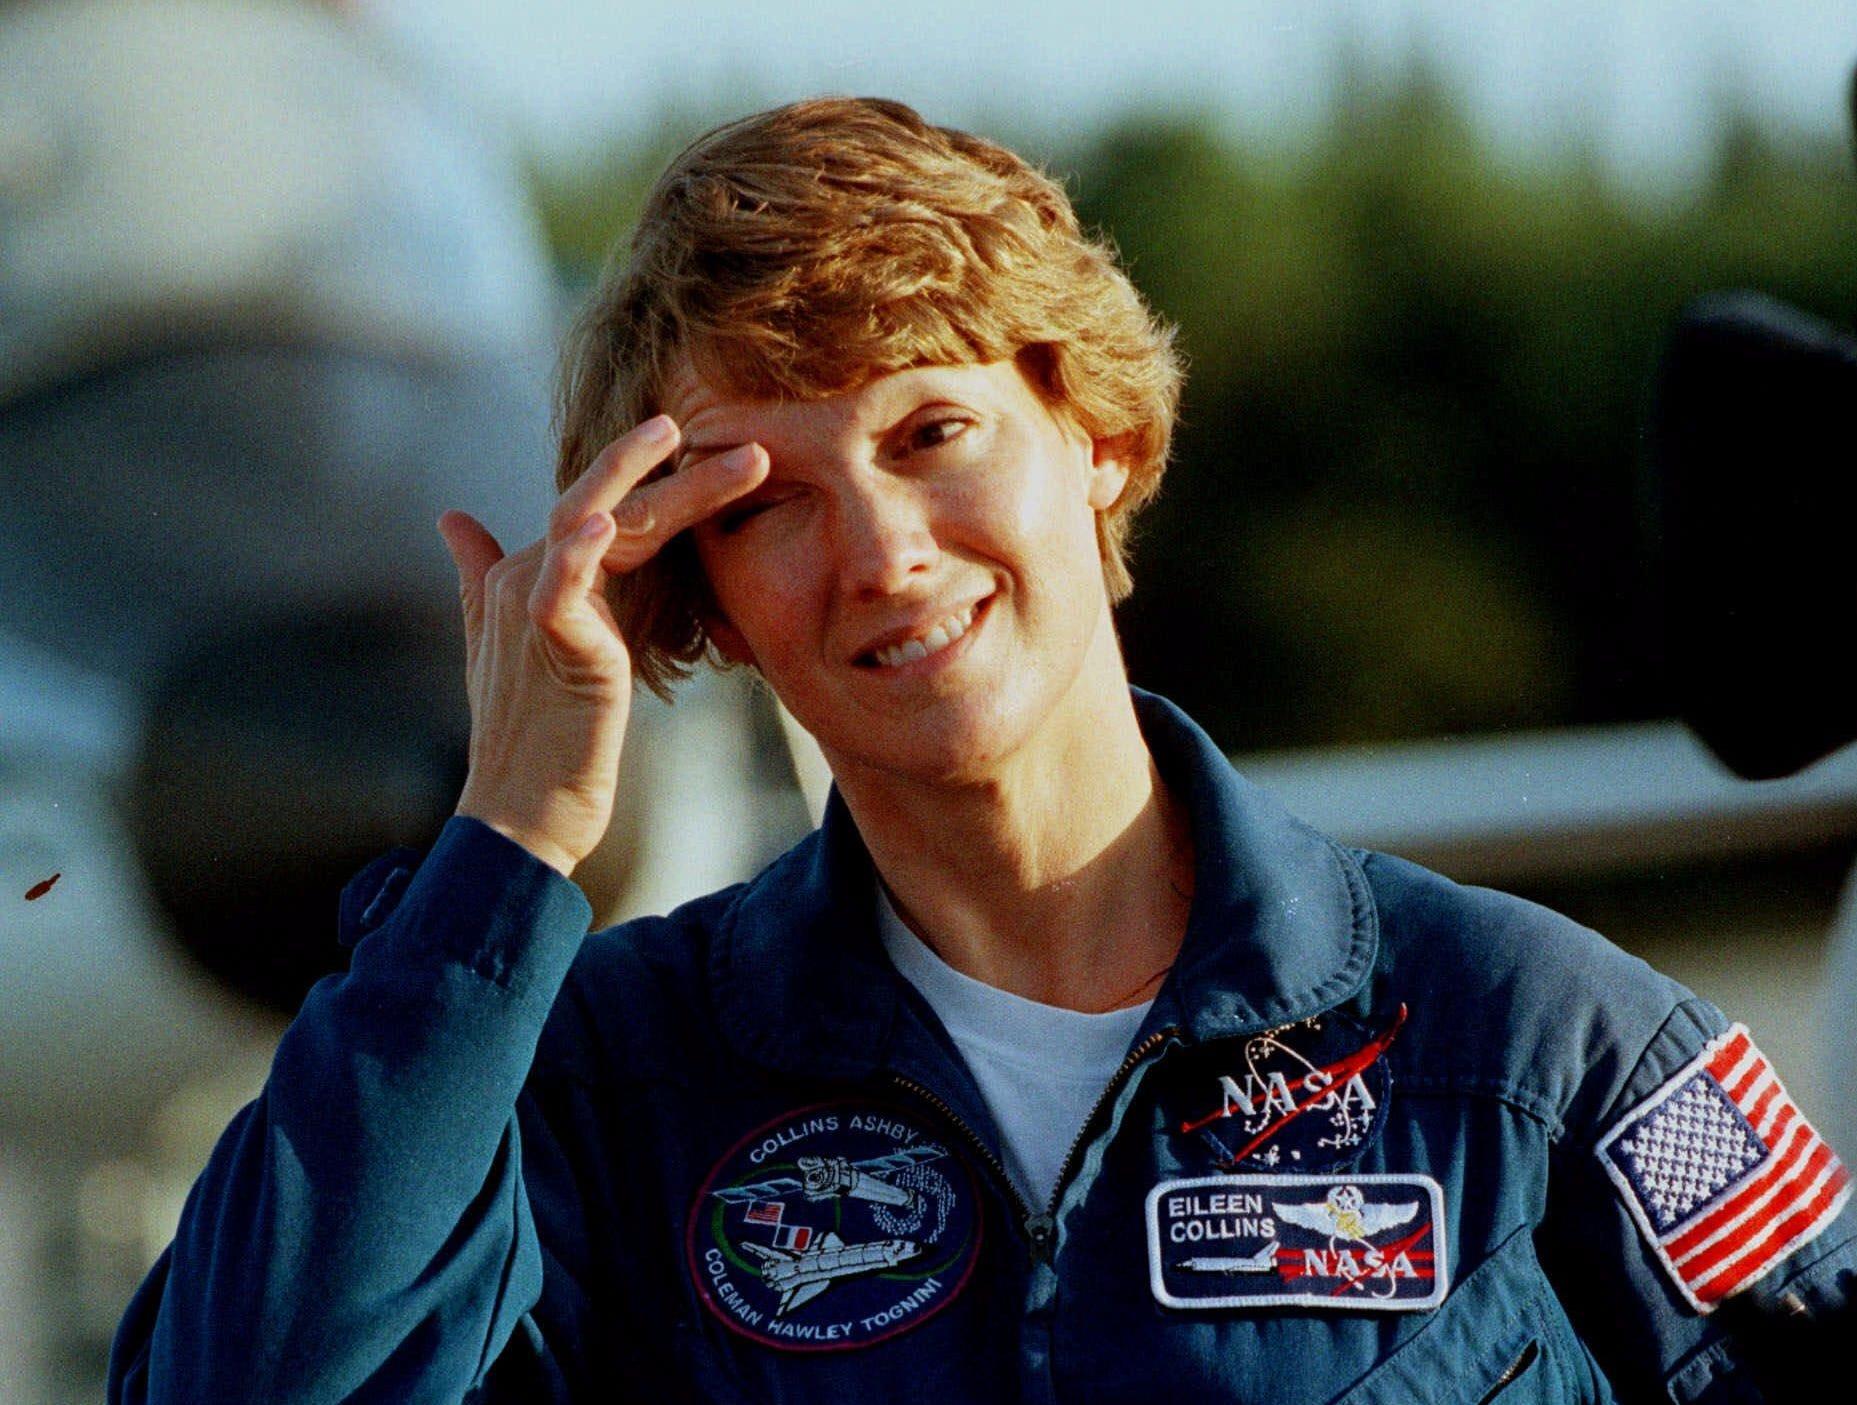 Elmira native and NASA astronaut Eileen Collins.